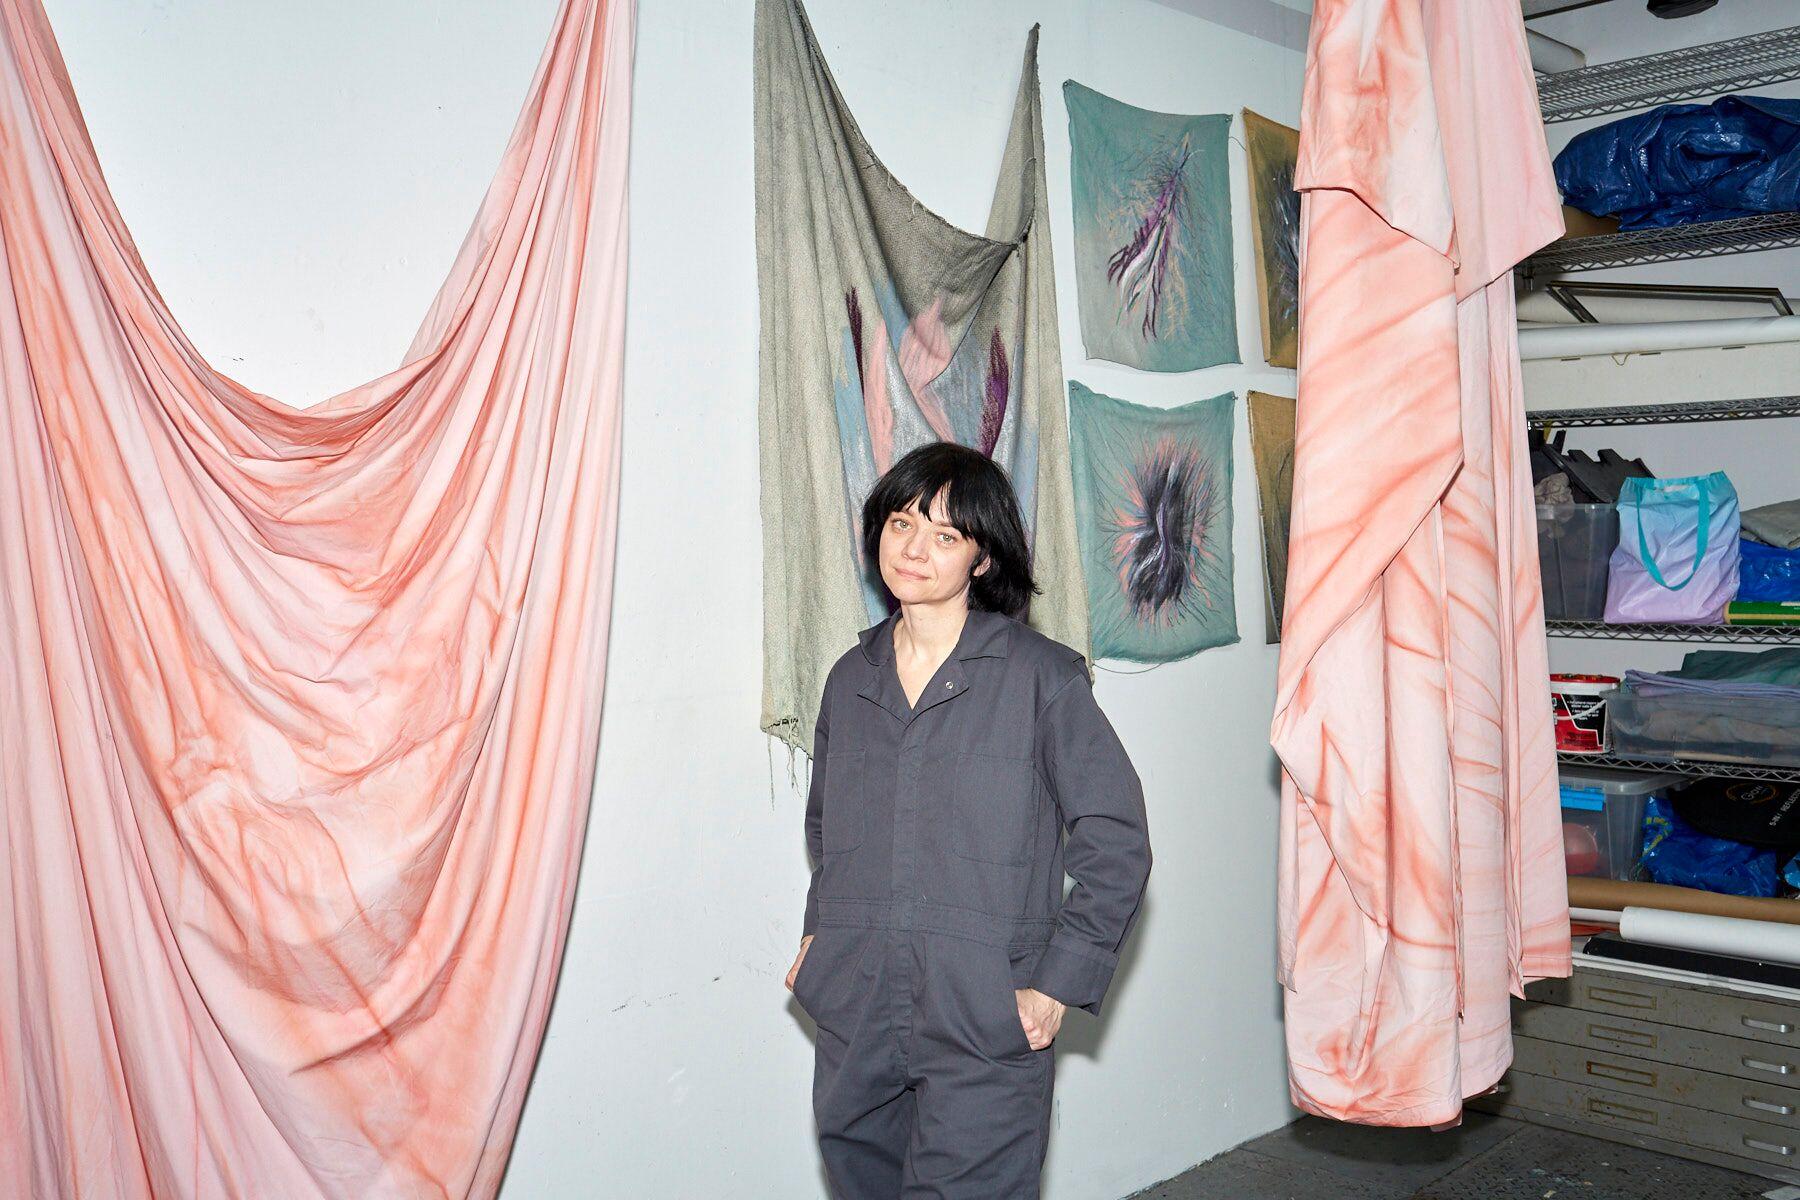 Also featured on the Artfare platform: artist Alex Wolkowicz, photographed by Anna Bauer.